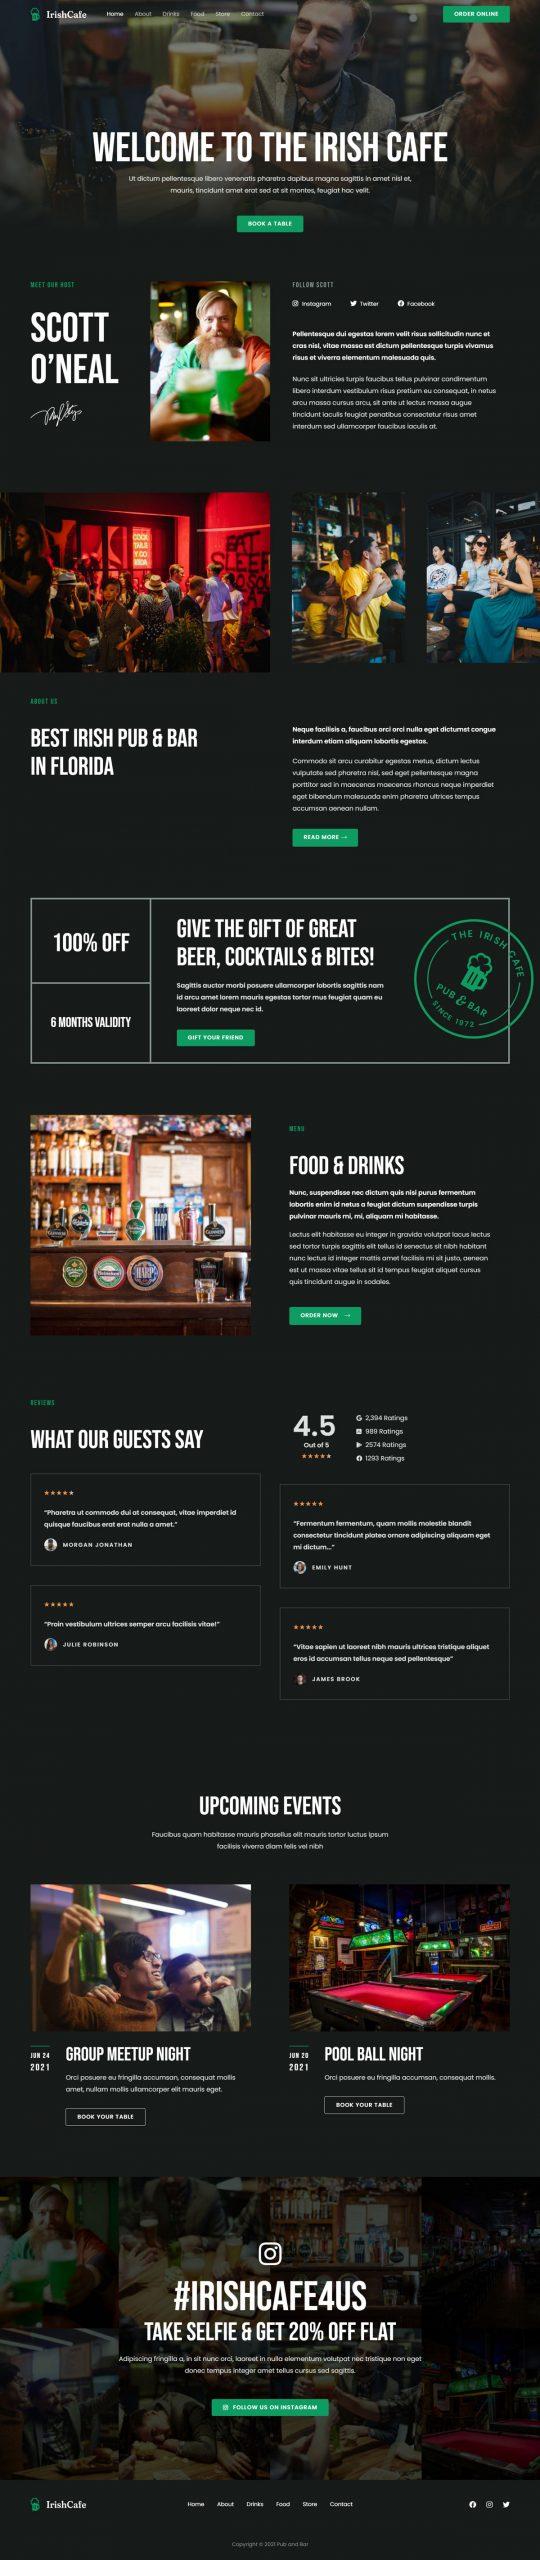 Adamo Web Design | Web Design Durham | pub and bar 02 home scaled